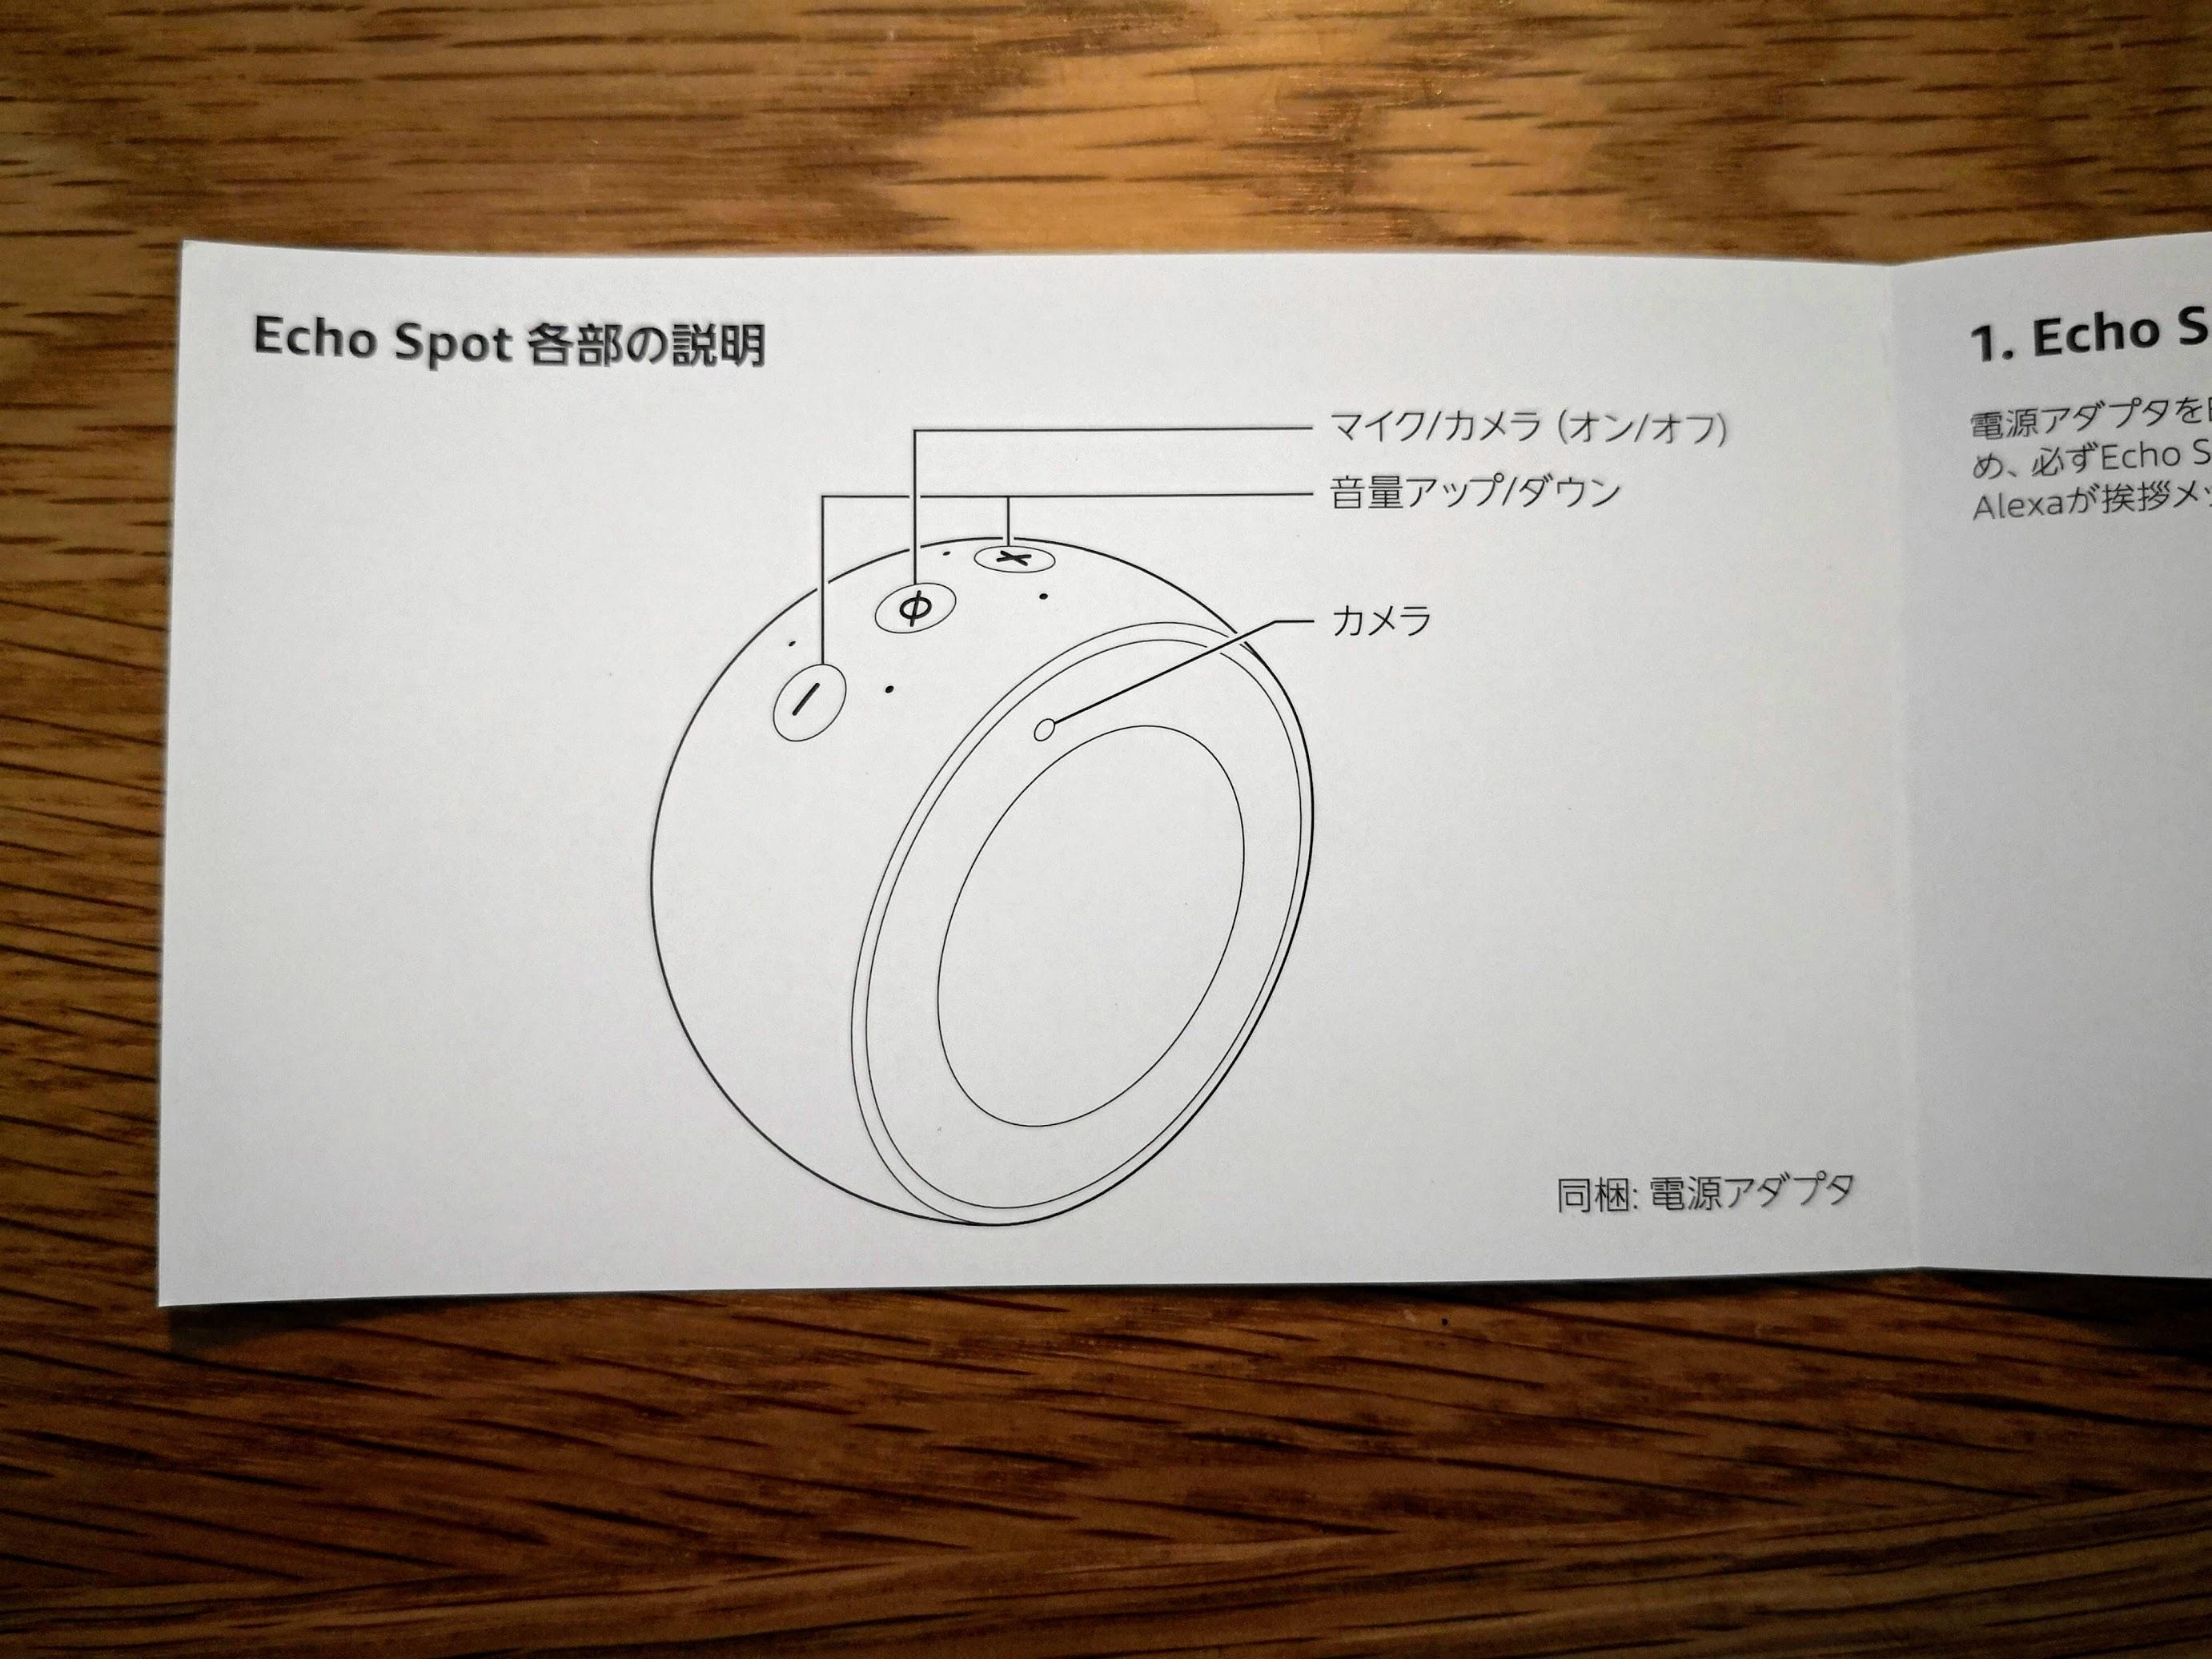 Amazon Echo Spotの説明書②